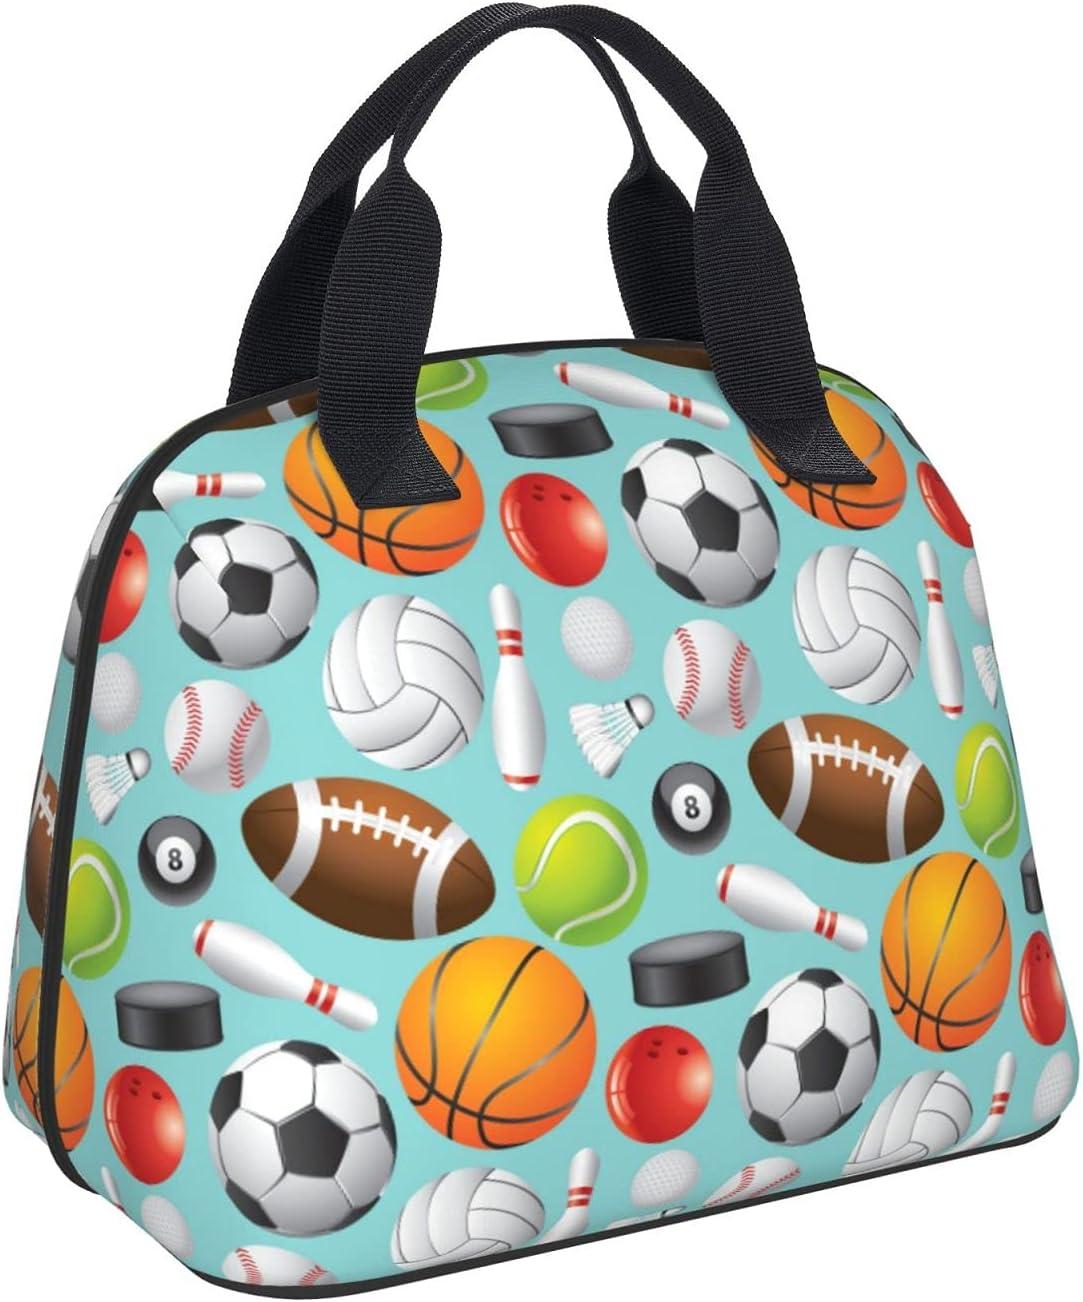 Sport Balls Reusable Insulated Ranking TOP19 Cooler - Detroit Mall Bag Lunch Portable